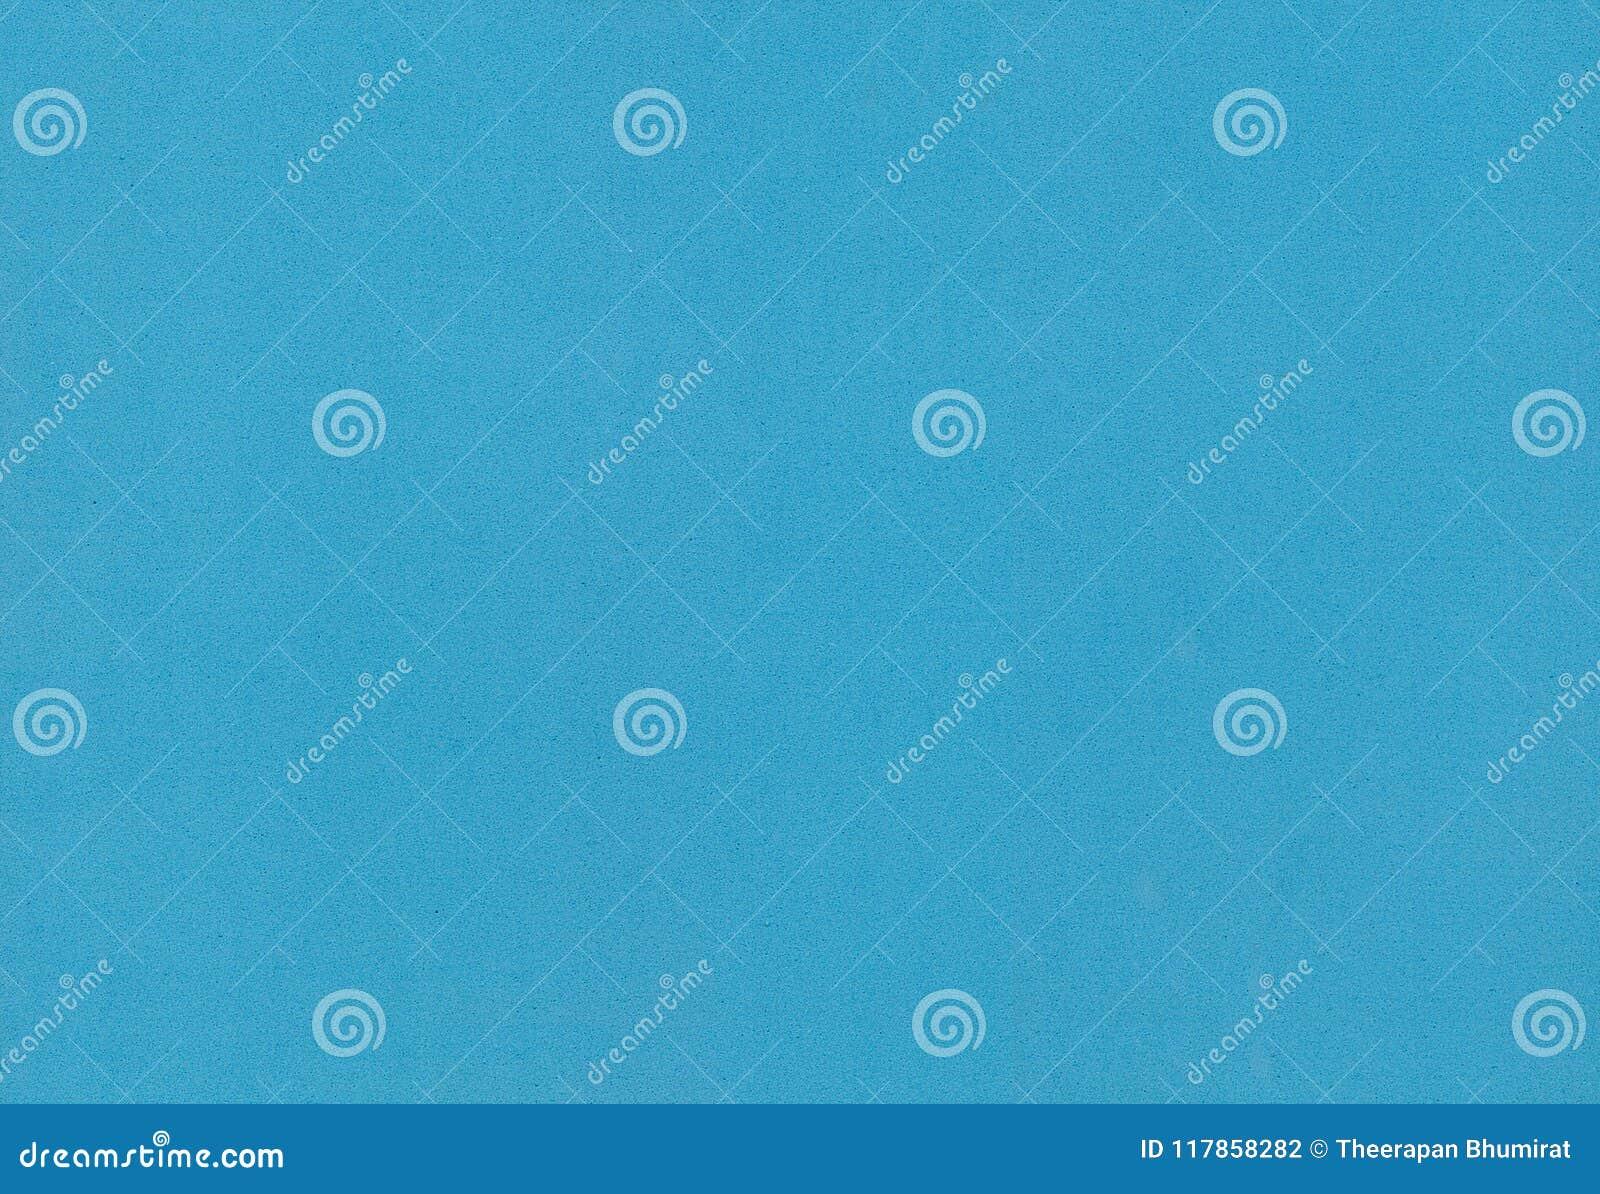 Blue color foam paper texture for background or design.